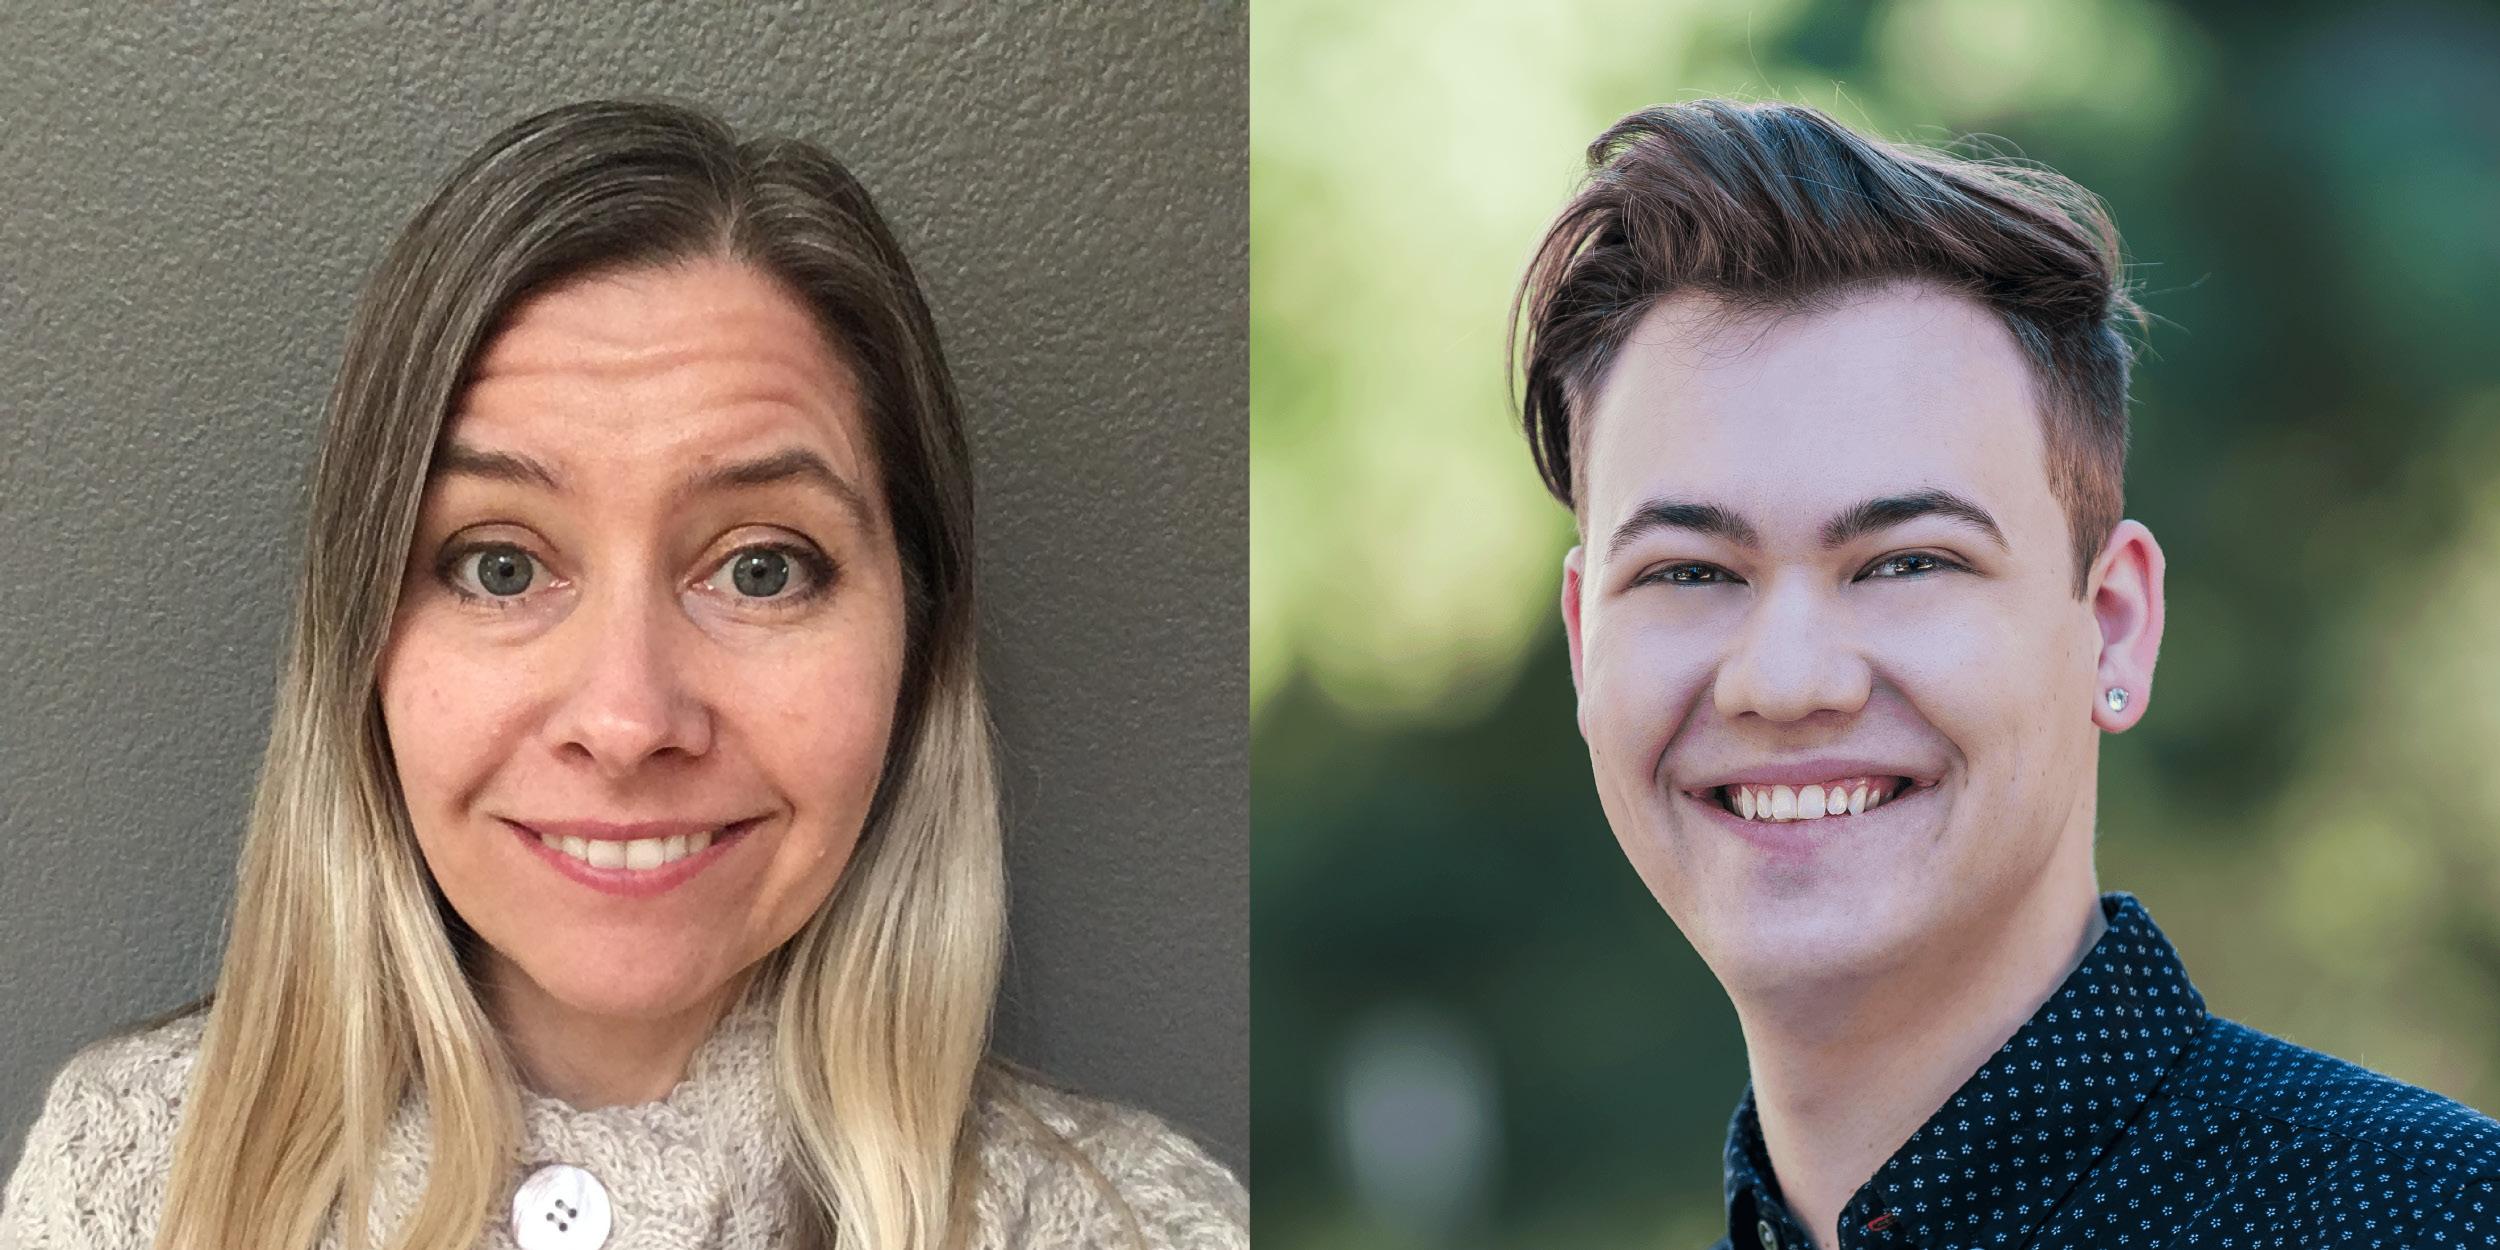 Headshots of Professor Rachel Martin and Student TJ